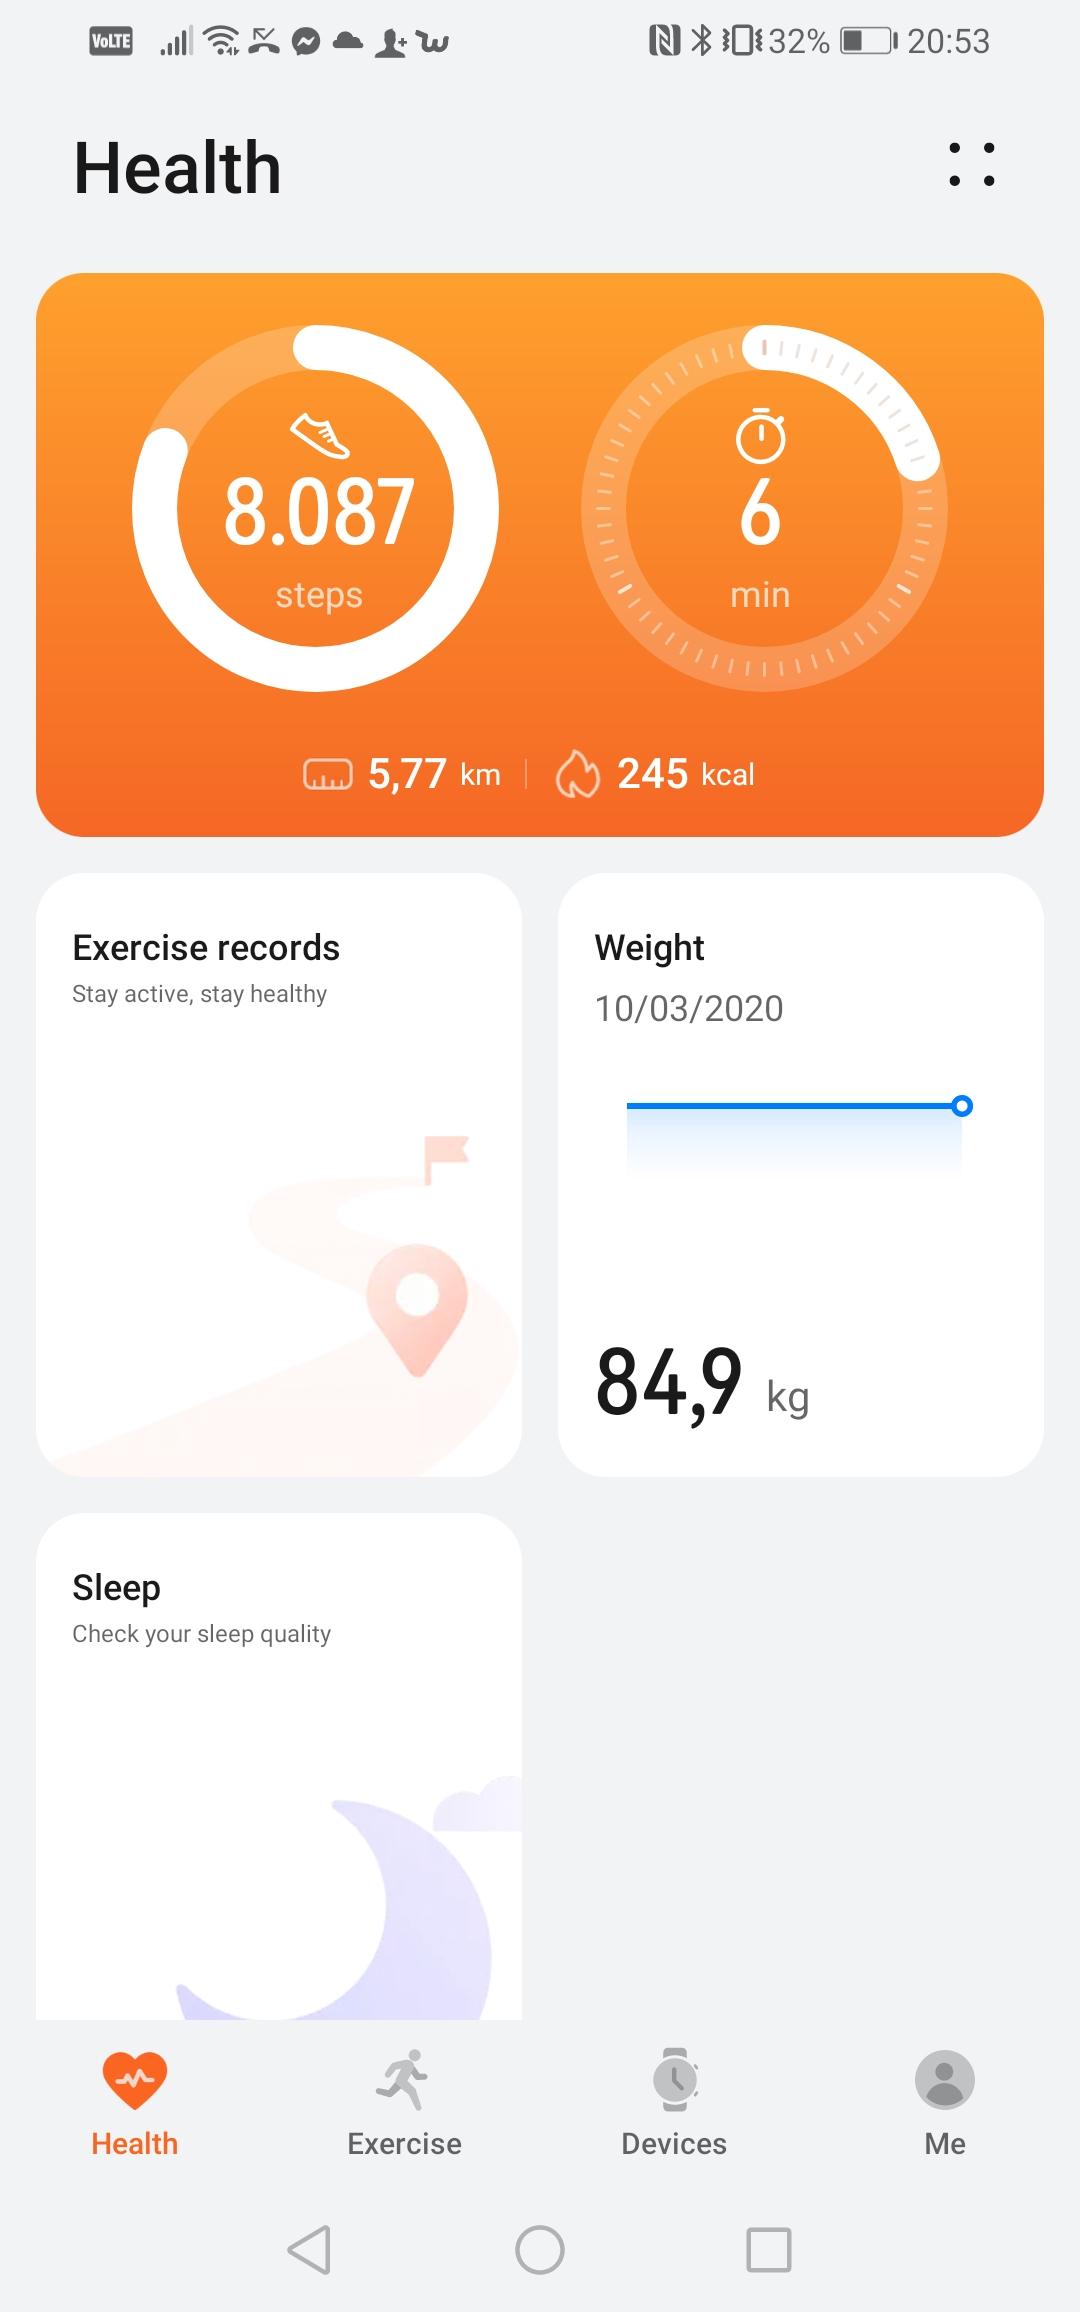 screenshot_20210513_205323_com-huawei-health